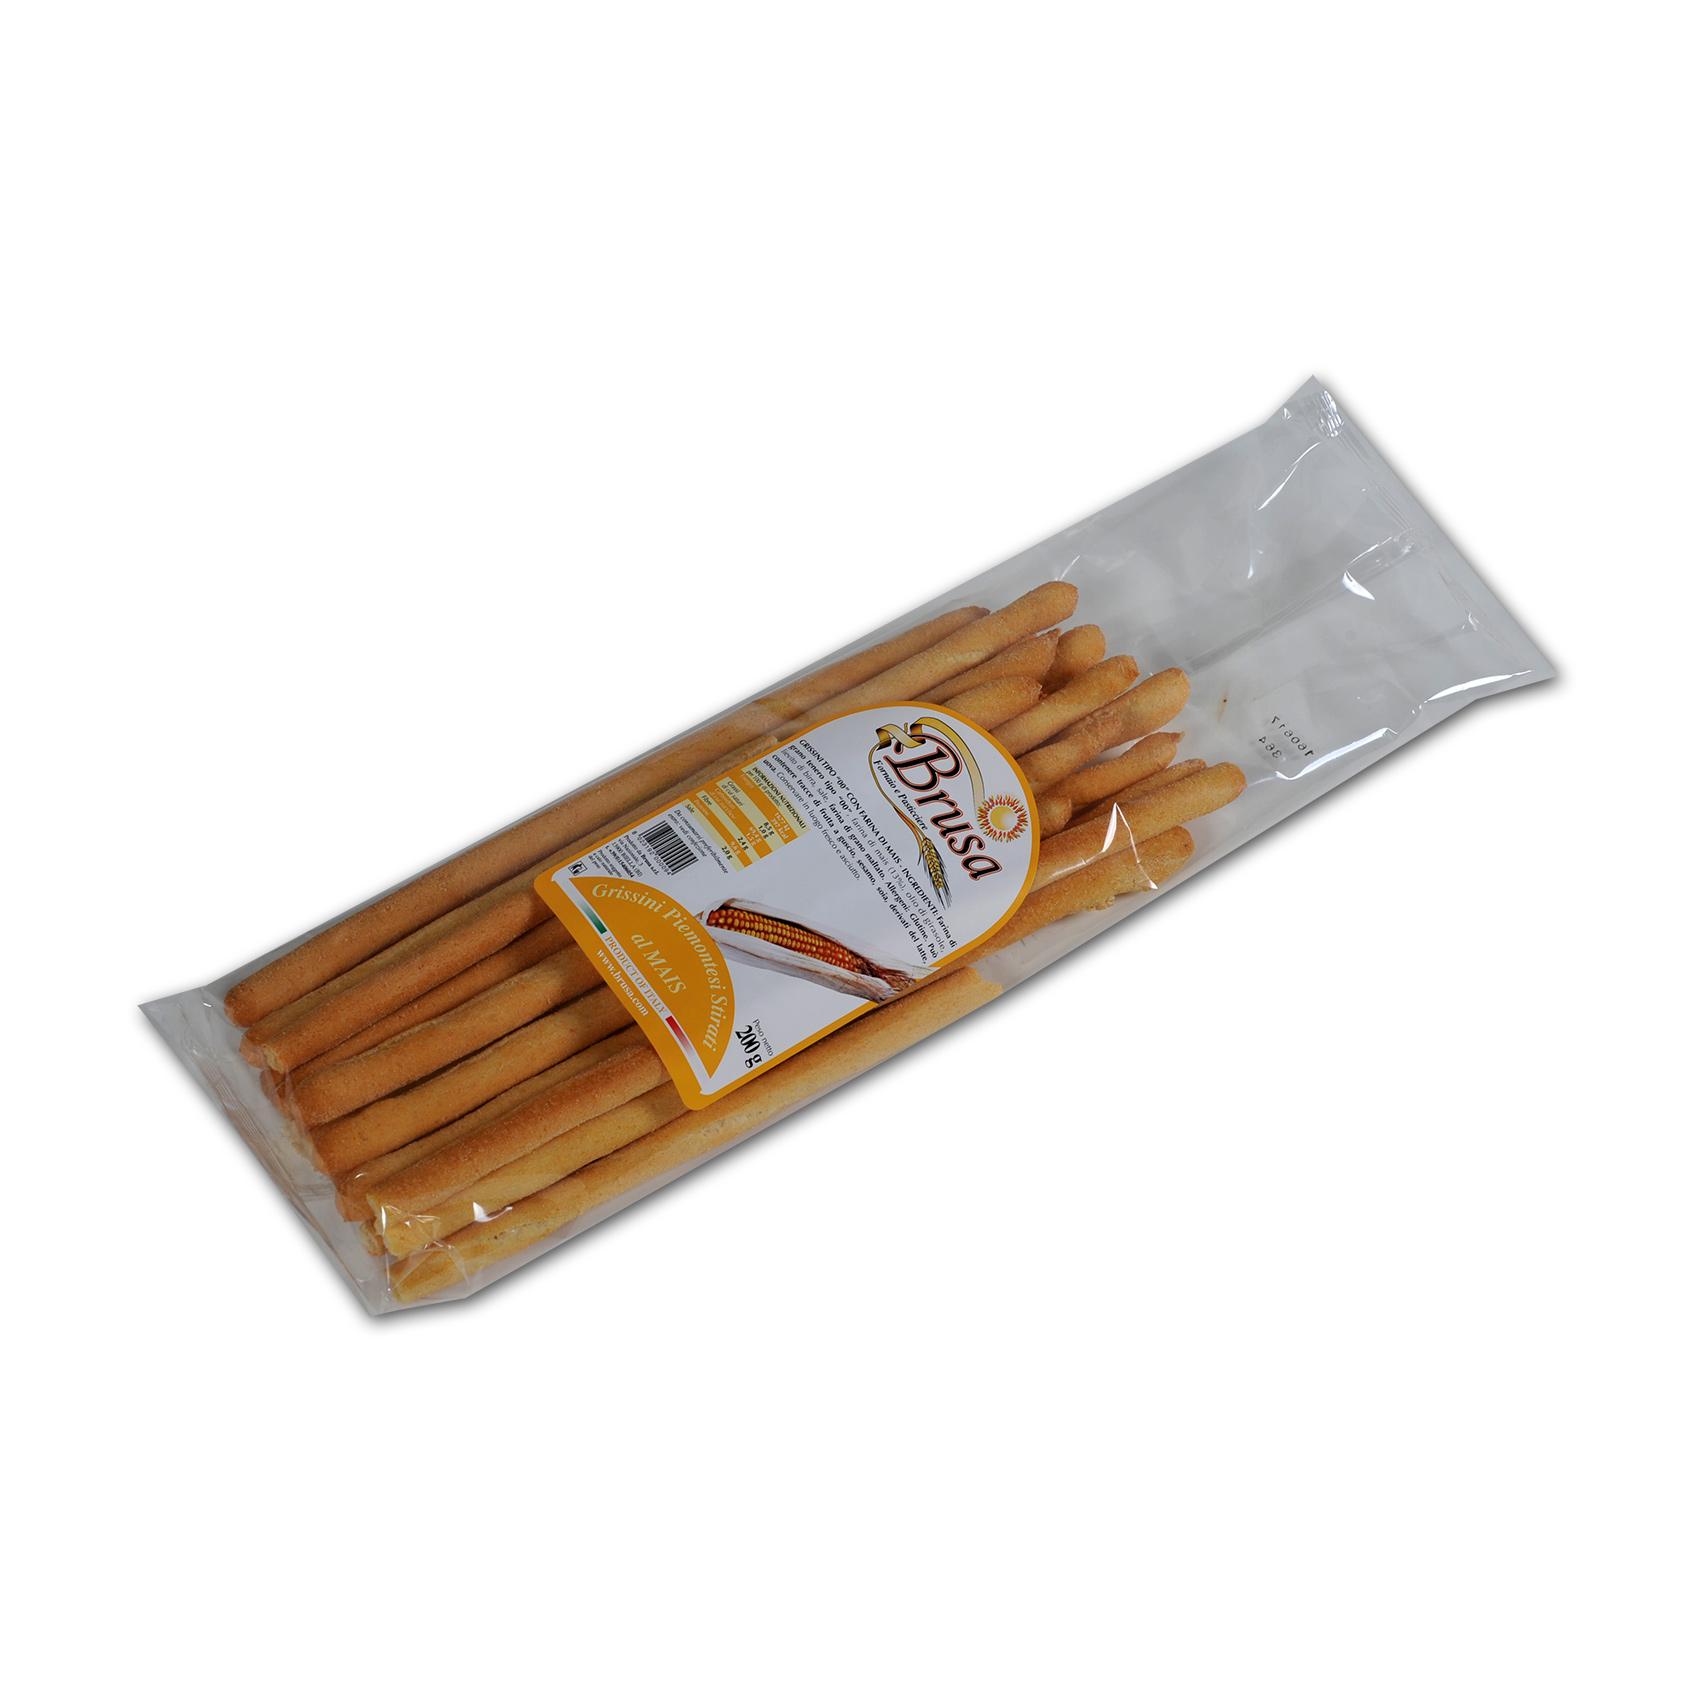 grissini-piemontesi皮埃蒙特玉米面包条-200g